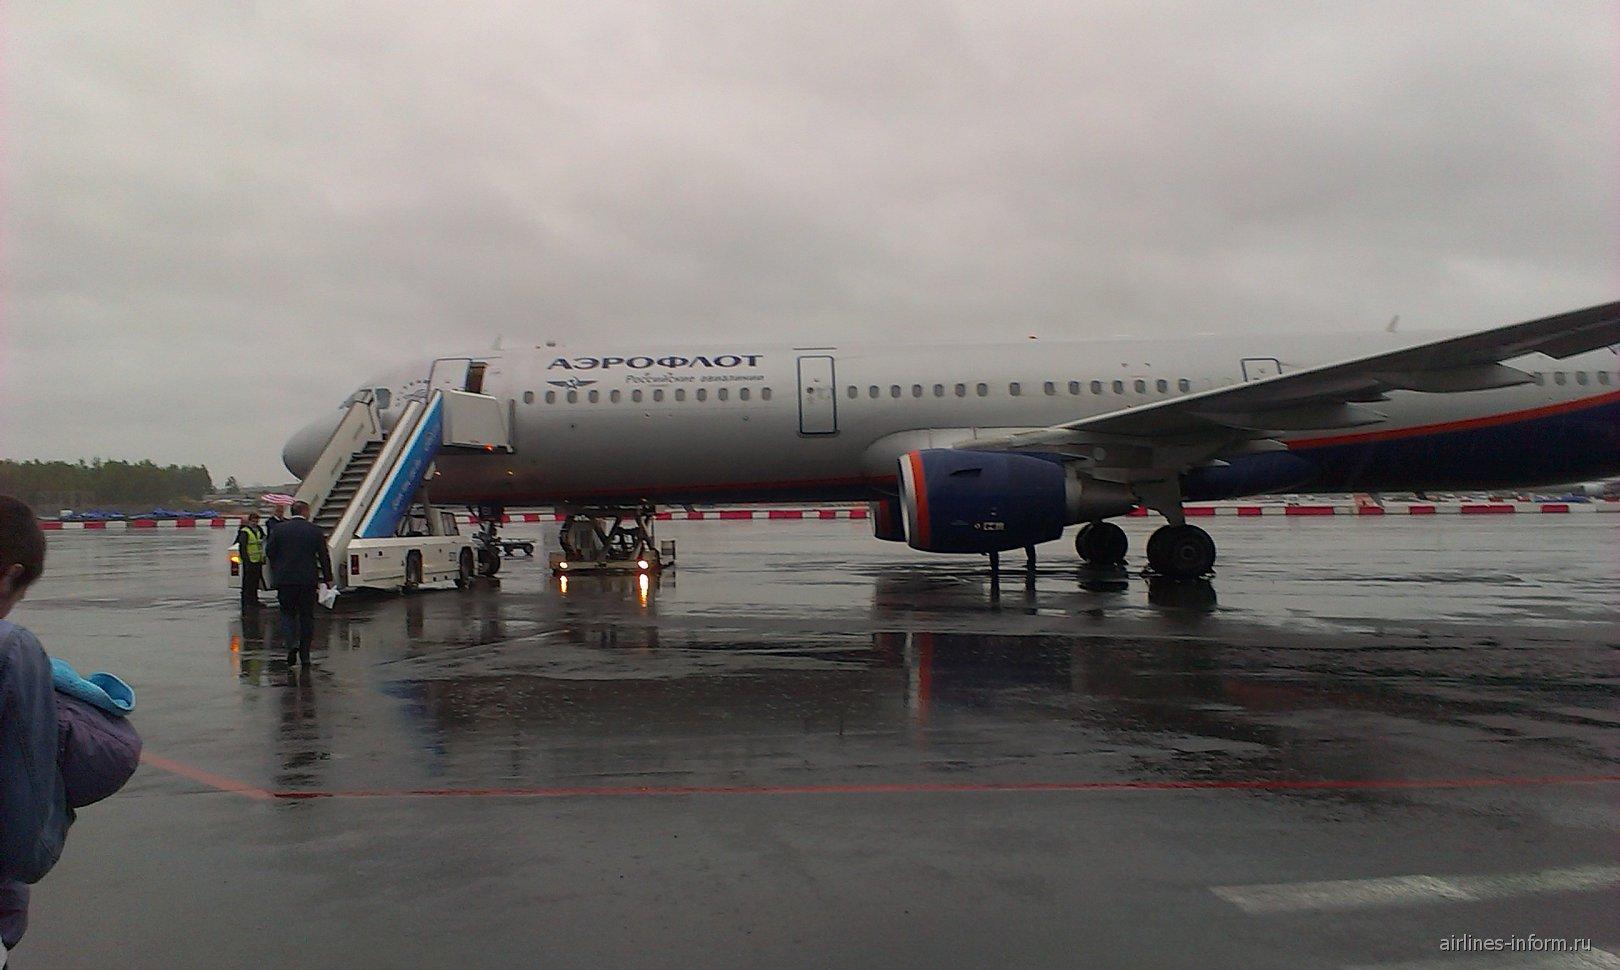 Airbus A321 Аэрофлота в аэропорту Пулково